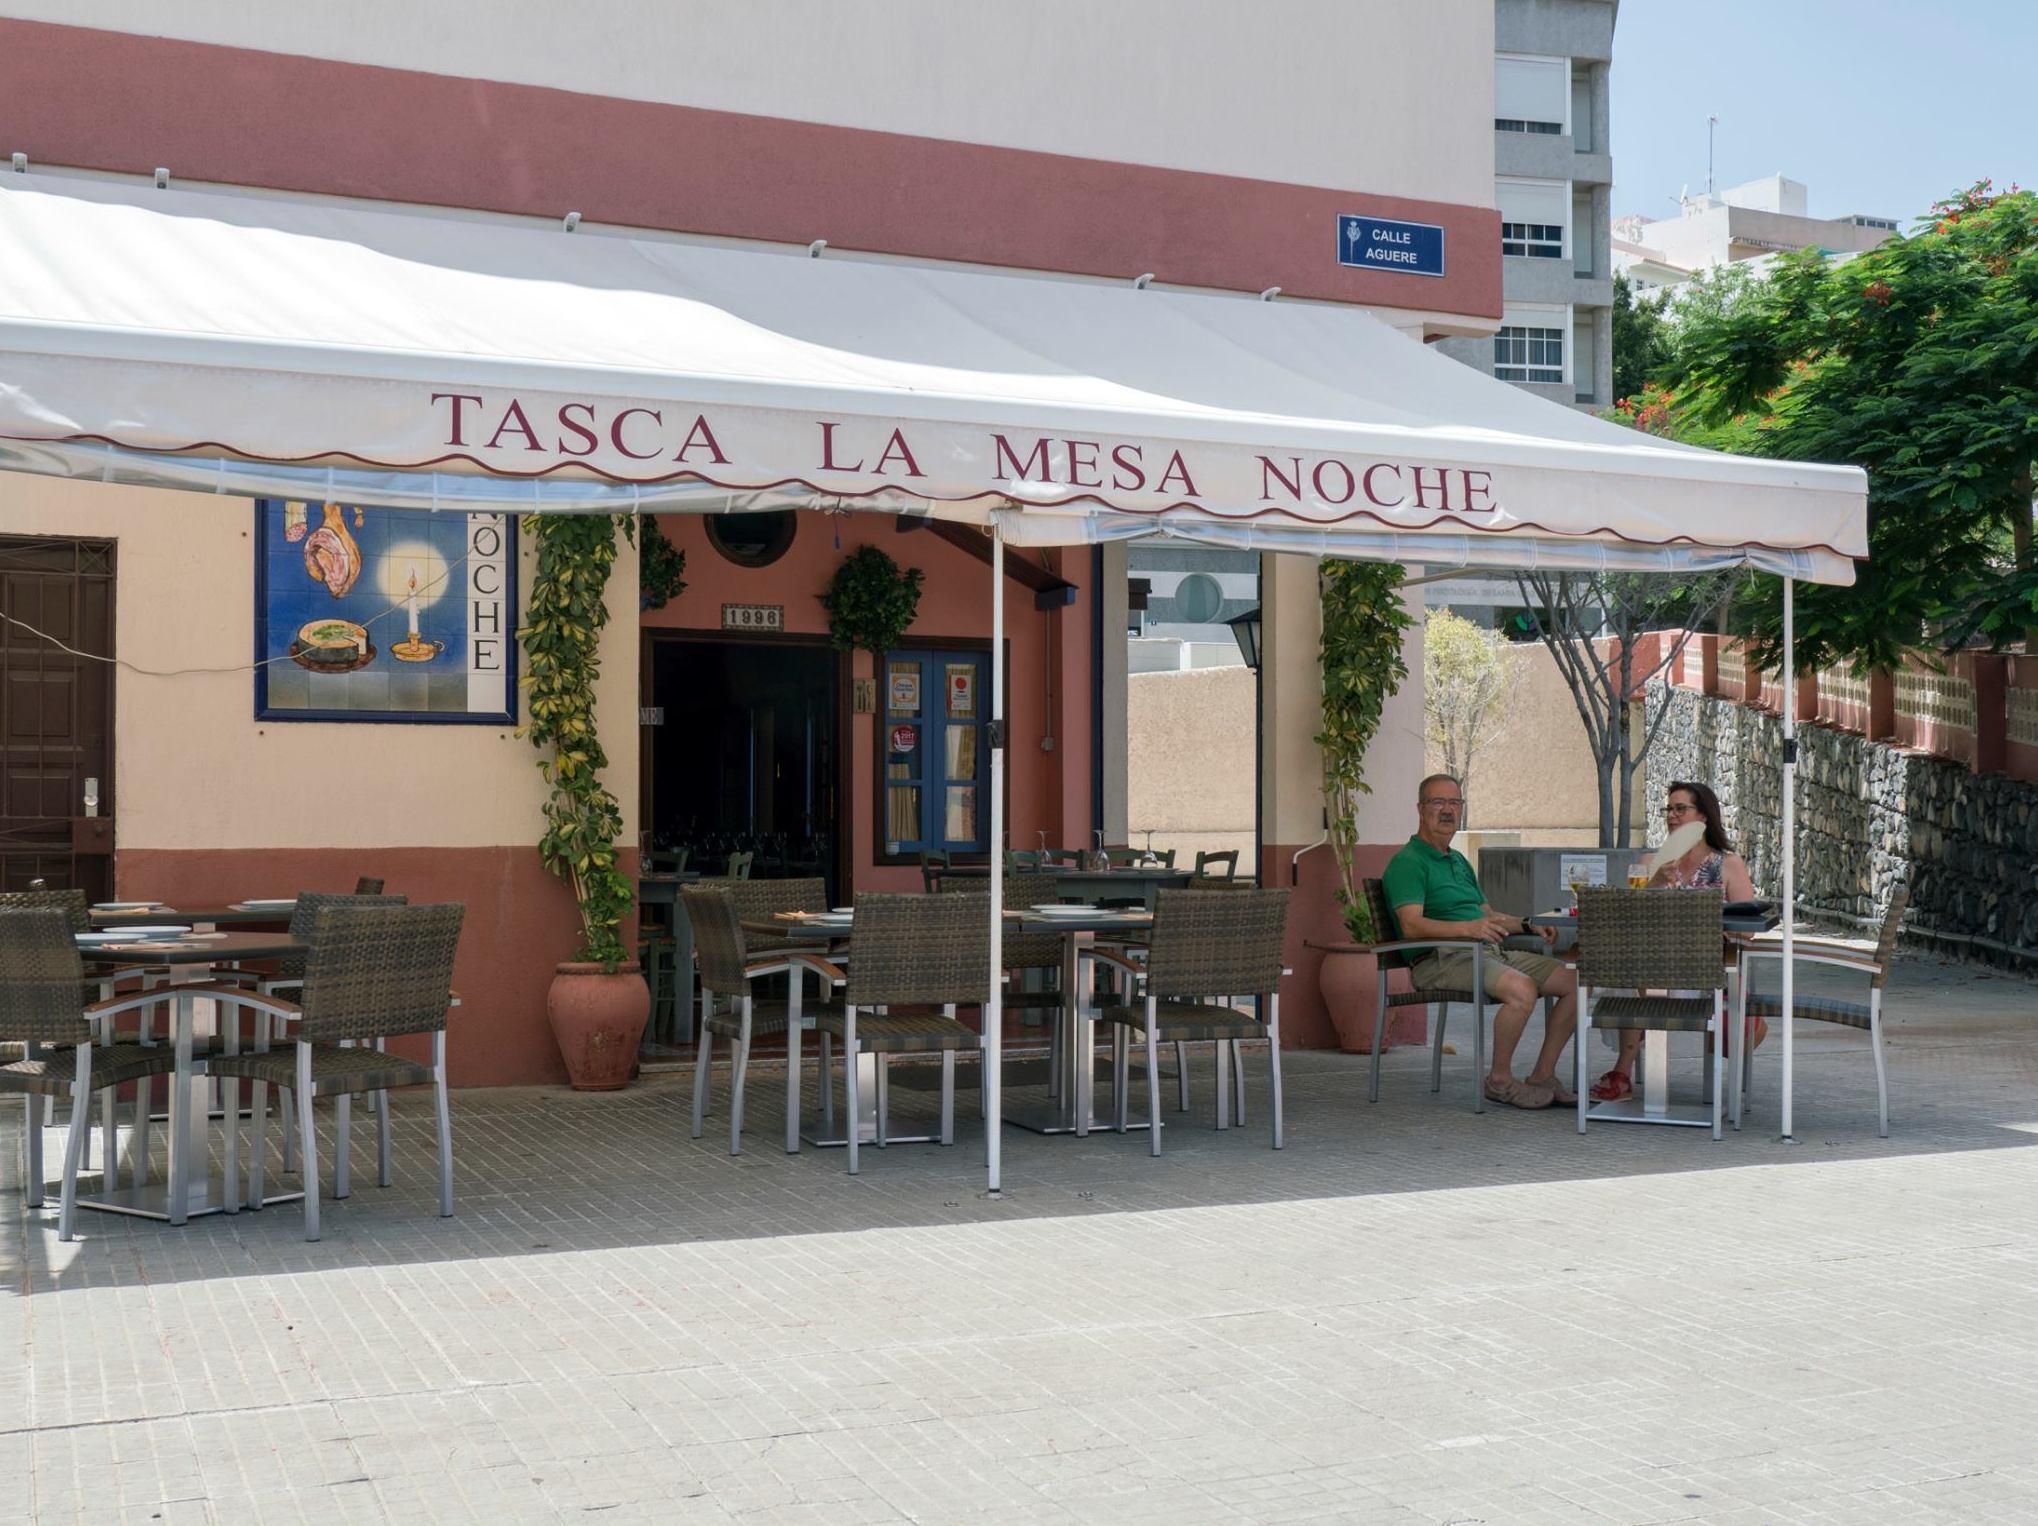 Dónde comer bien en Tenerife.